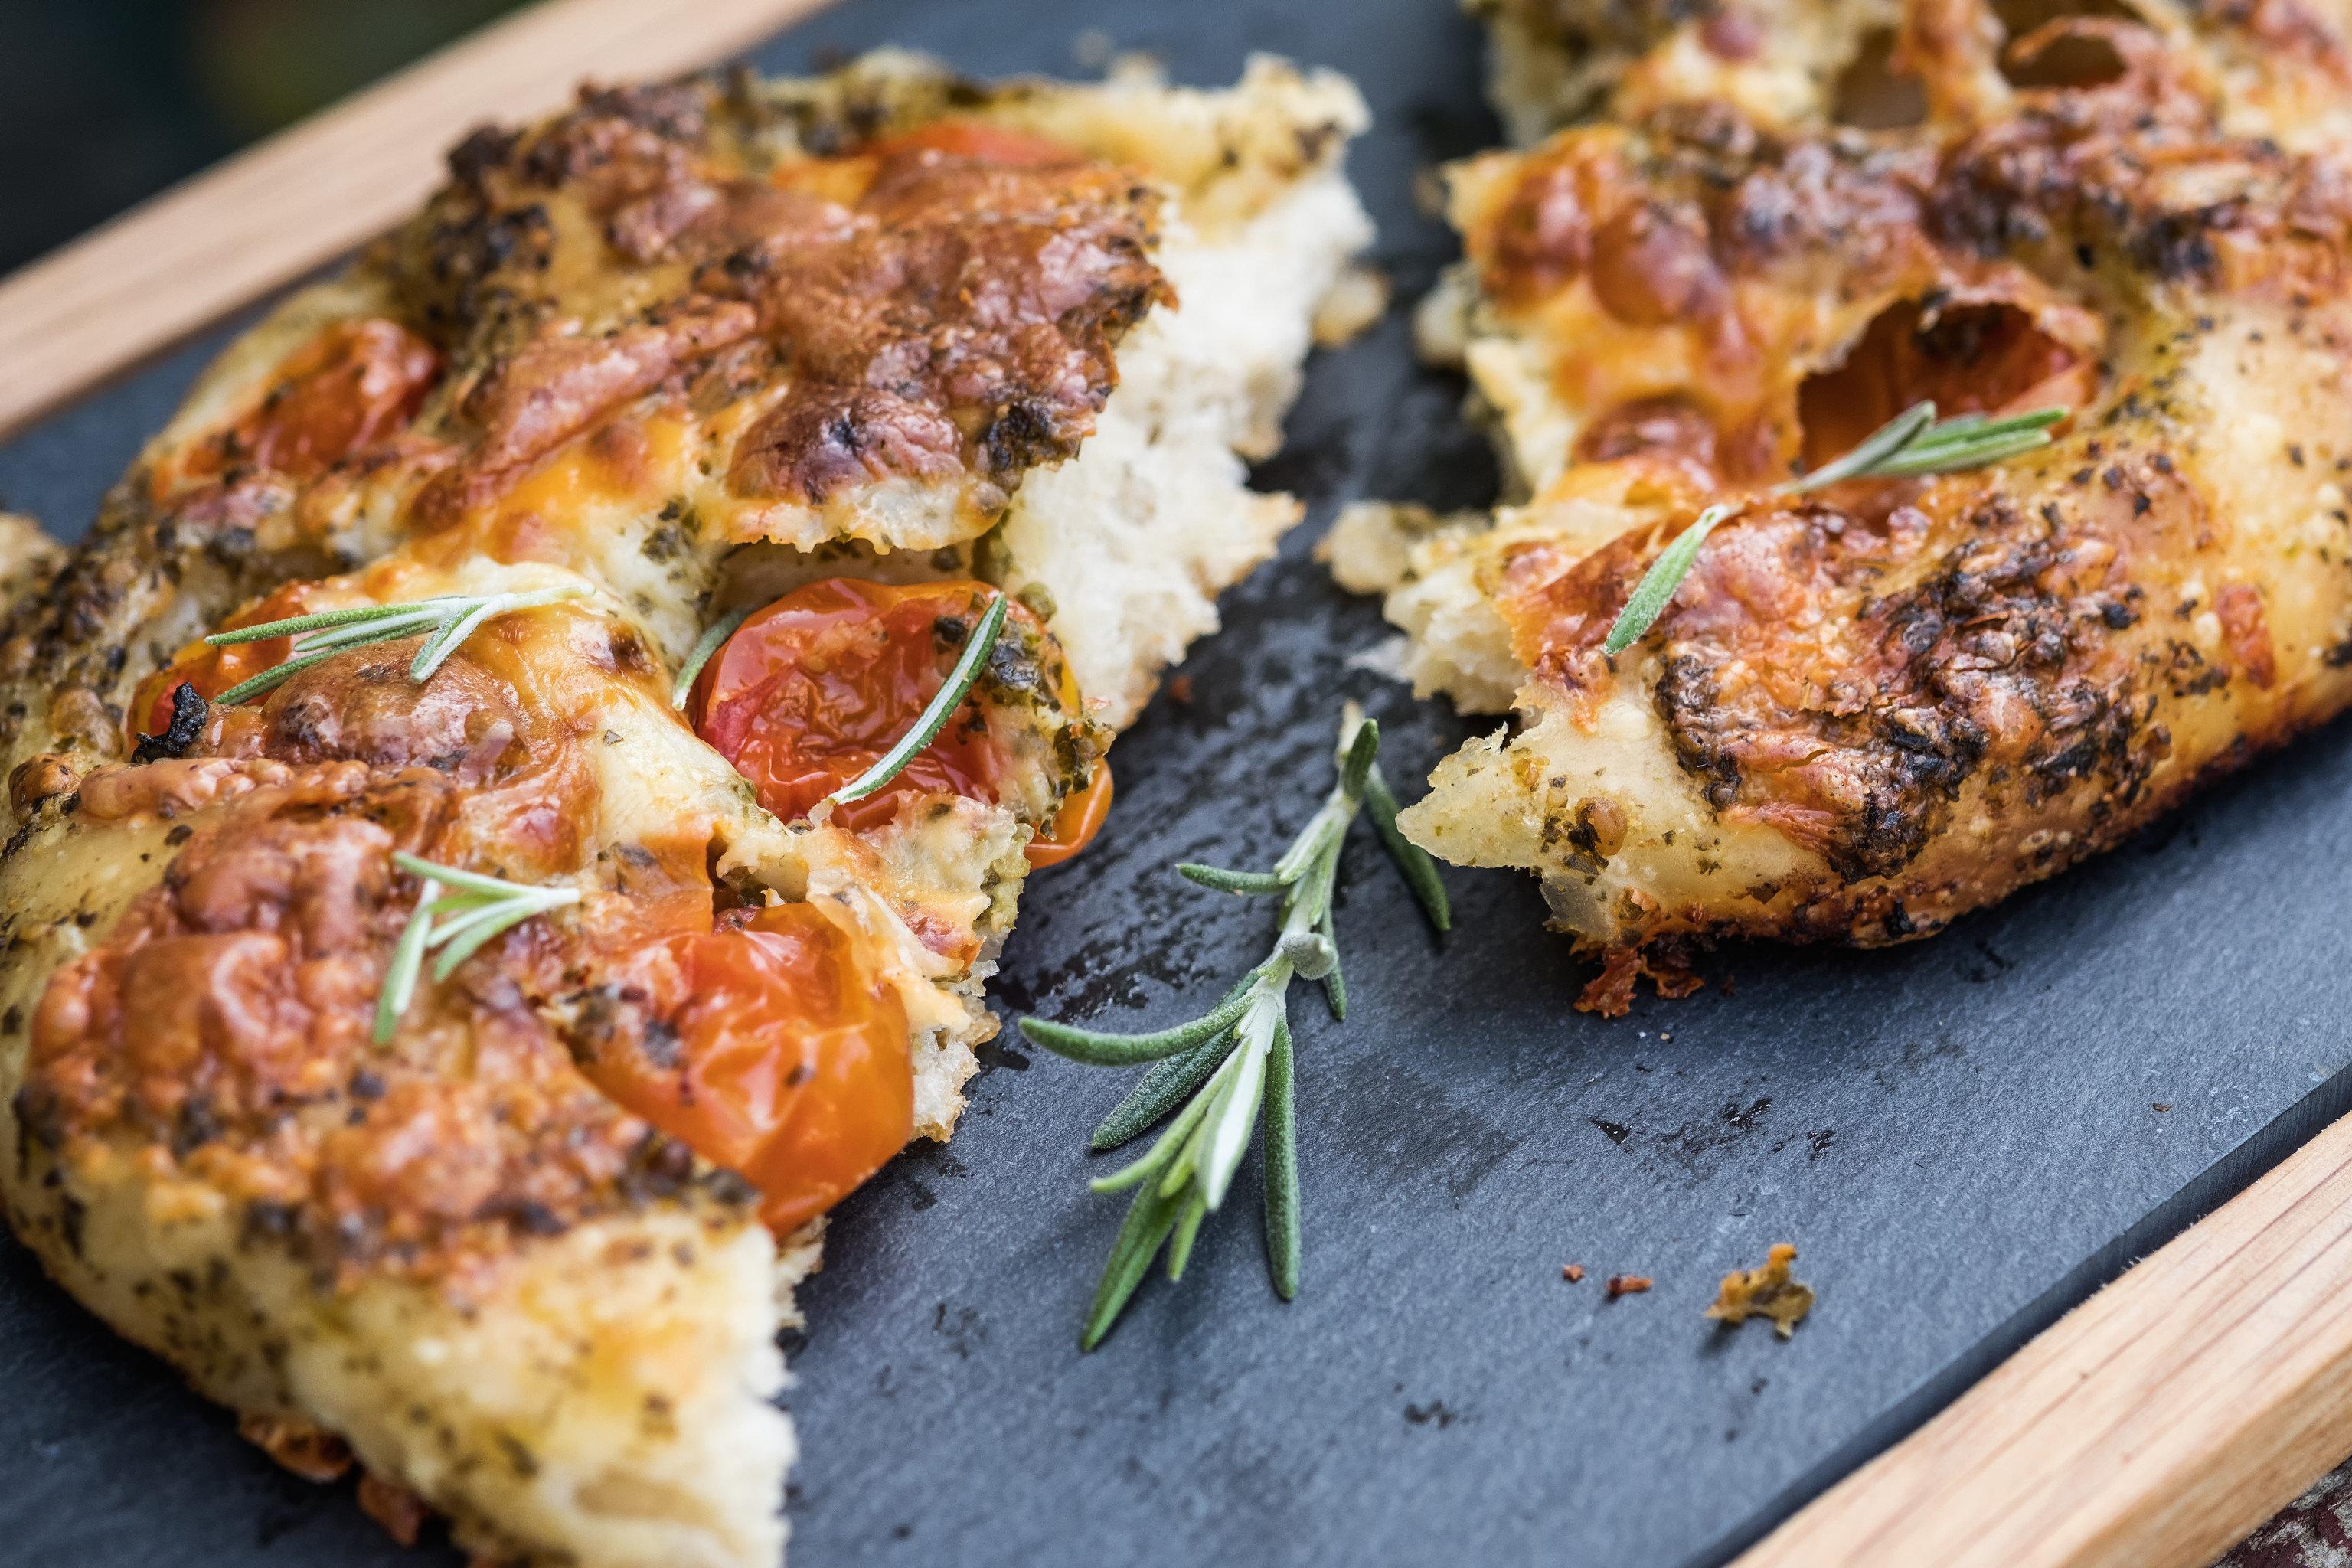 Food + Drink food dish piece slice meat produce cuisine vegetable fried food meal breakfast close pizza